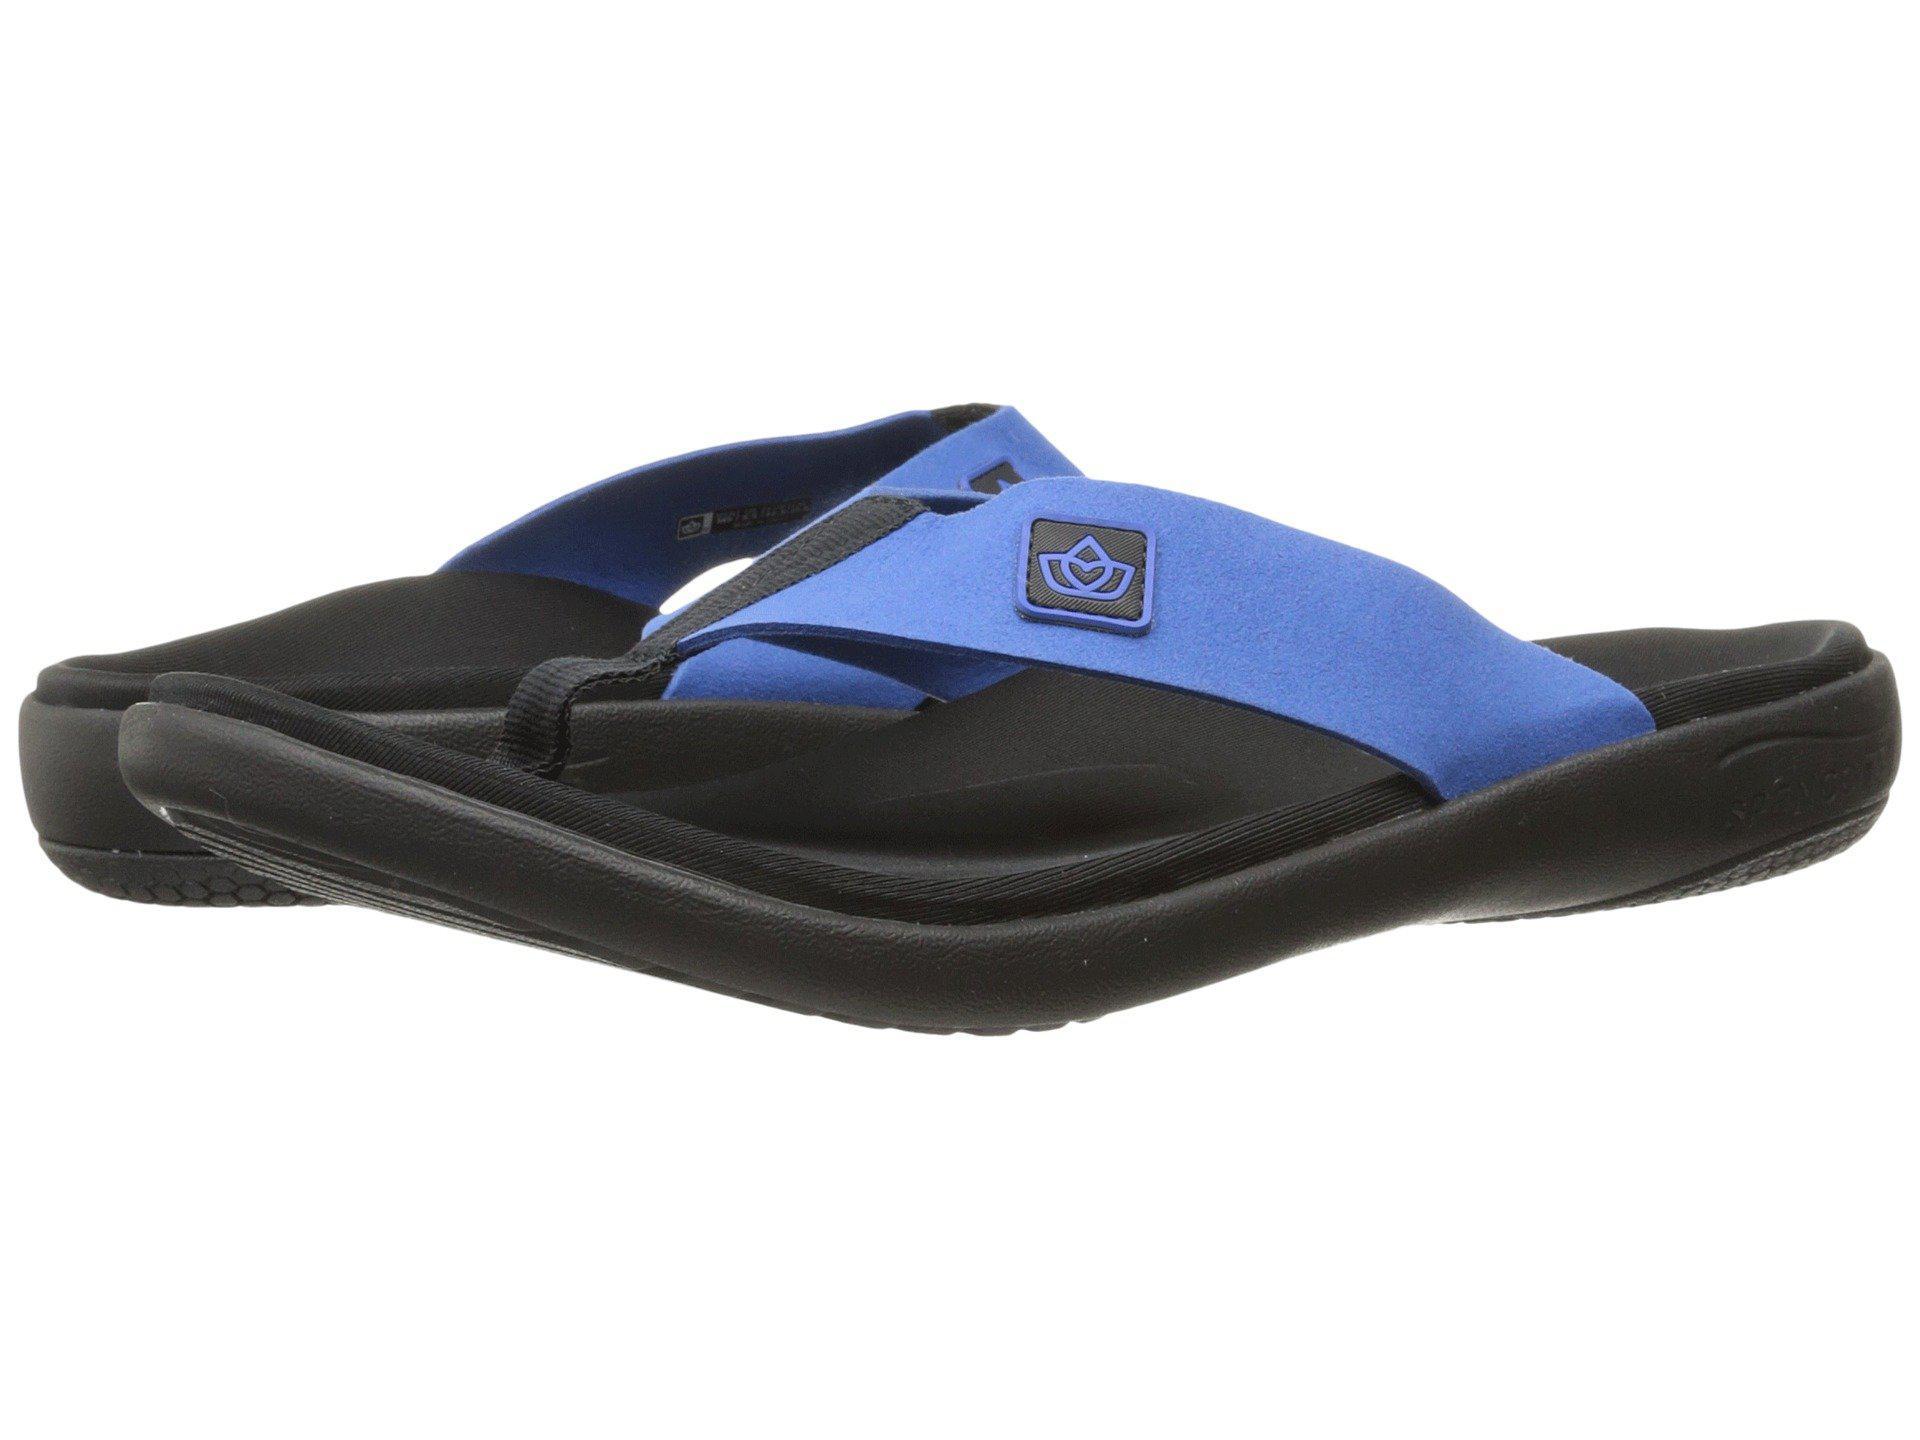 6d2a26f01bdb Lyst - Spenco Pure Sandal (charcoal) Men s Shoes in Blue for Men ...